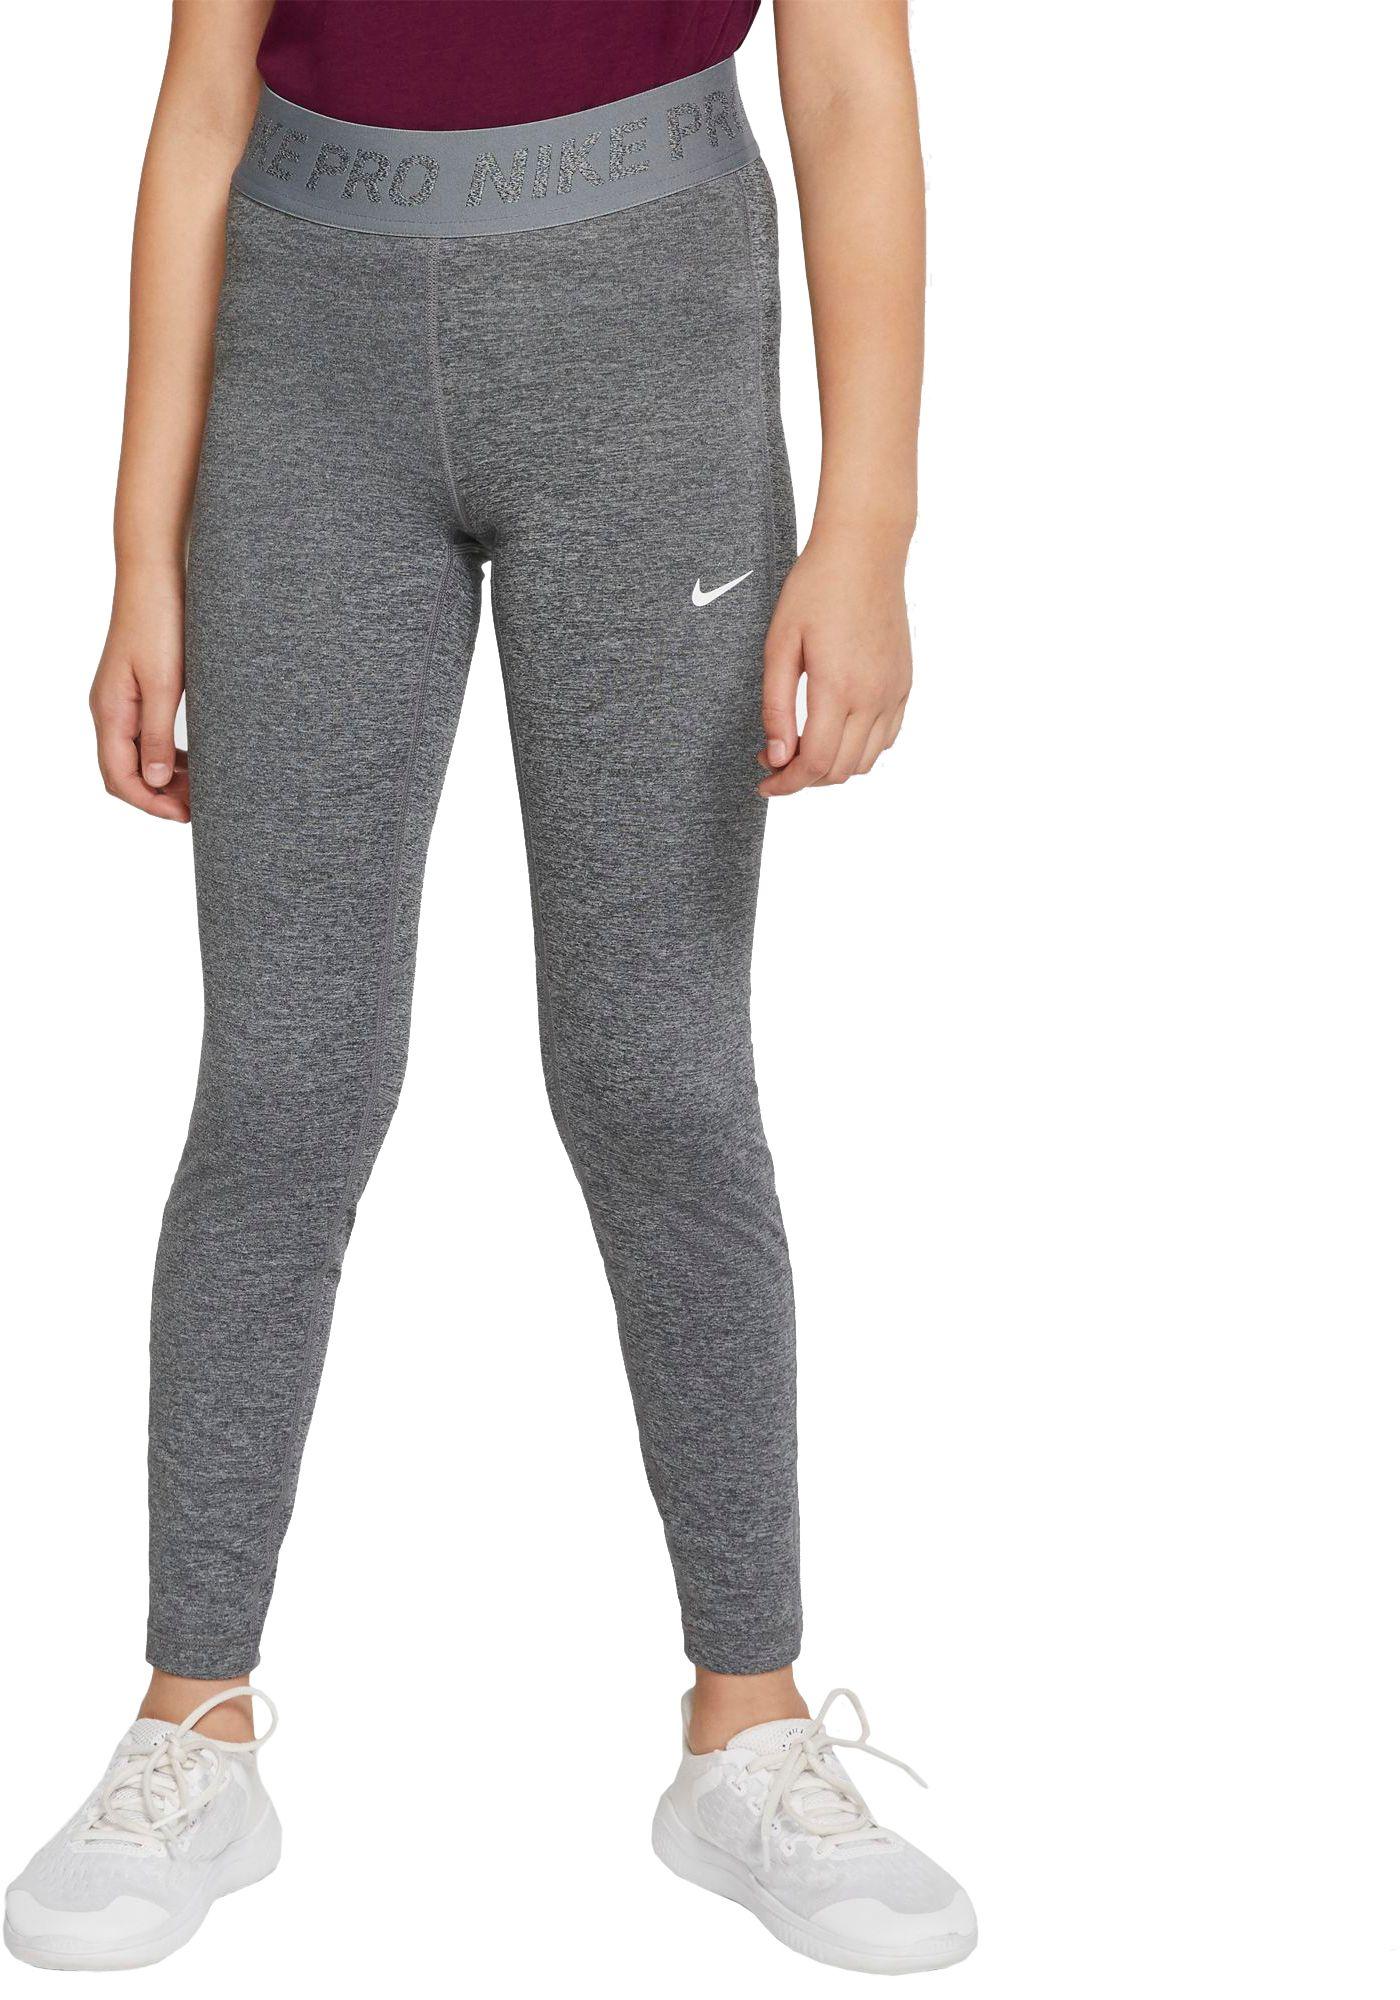 Nike Girls' Pro Warm Tights